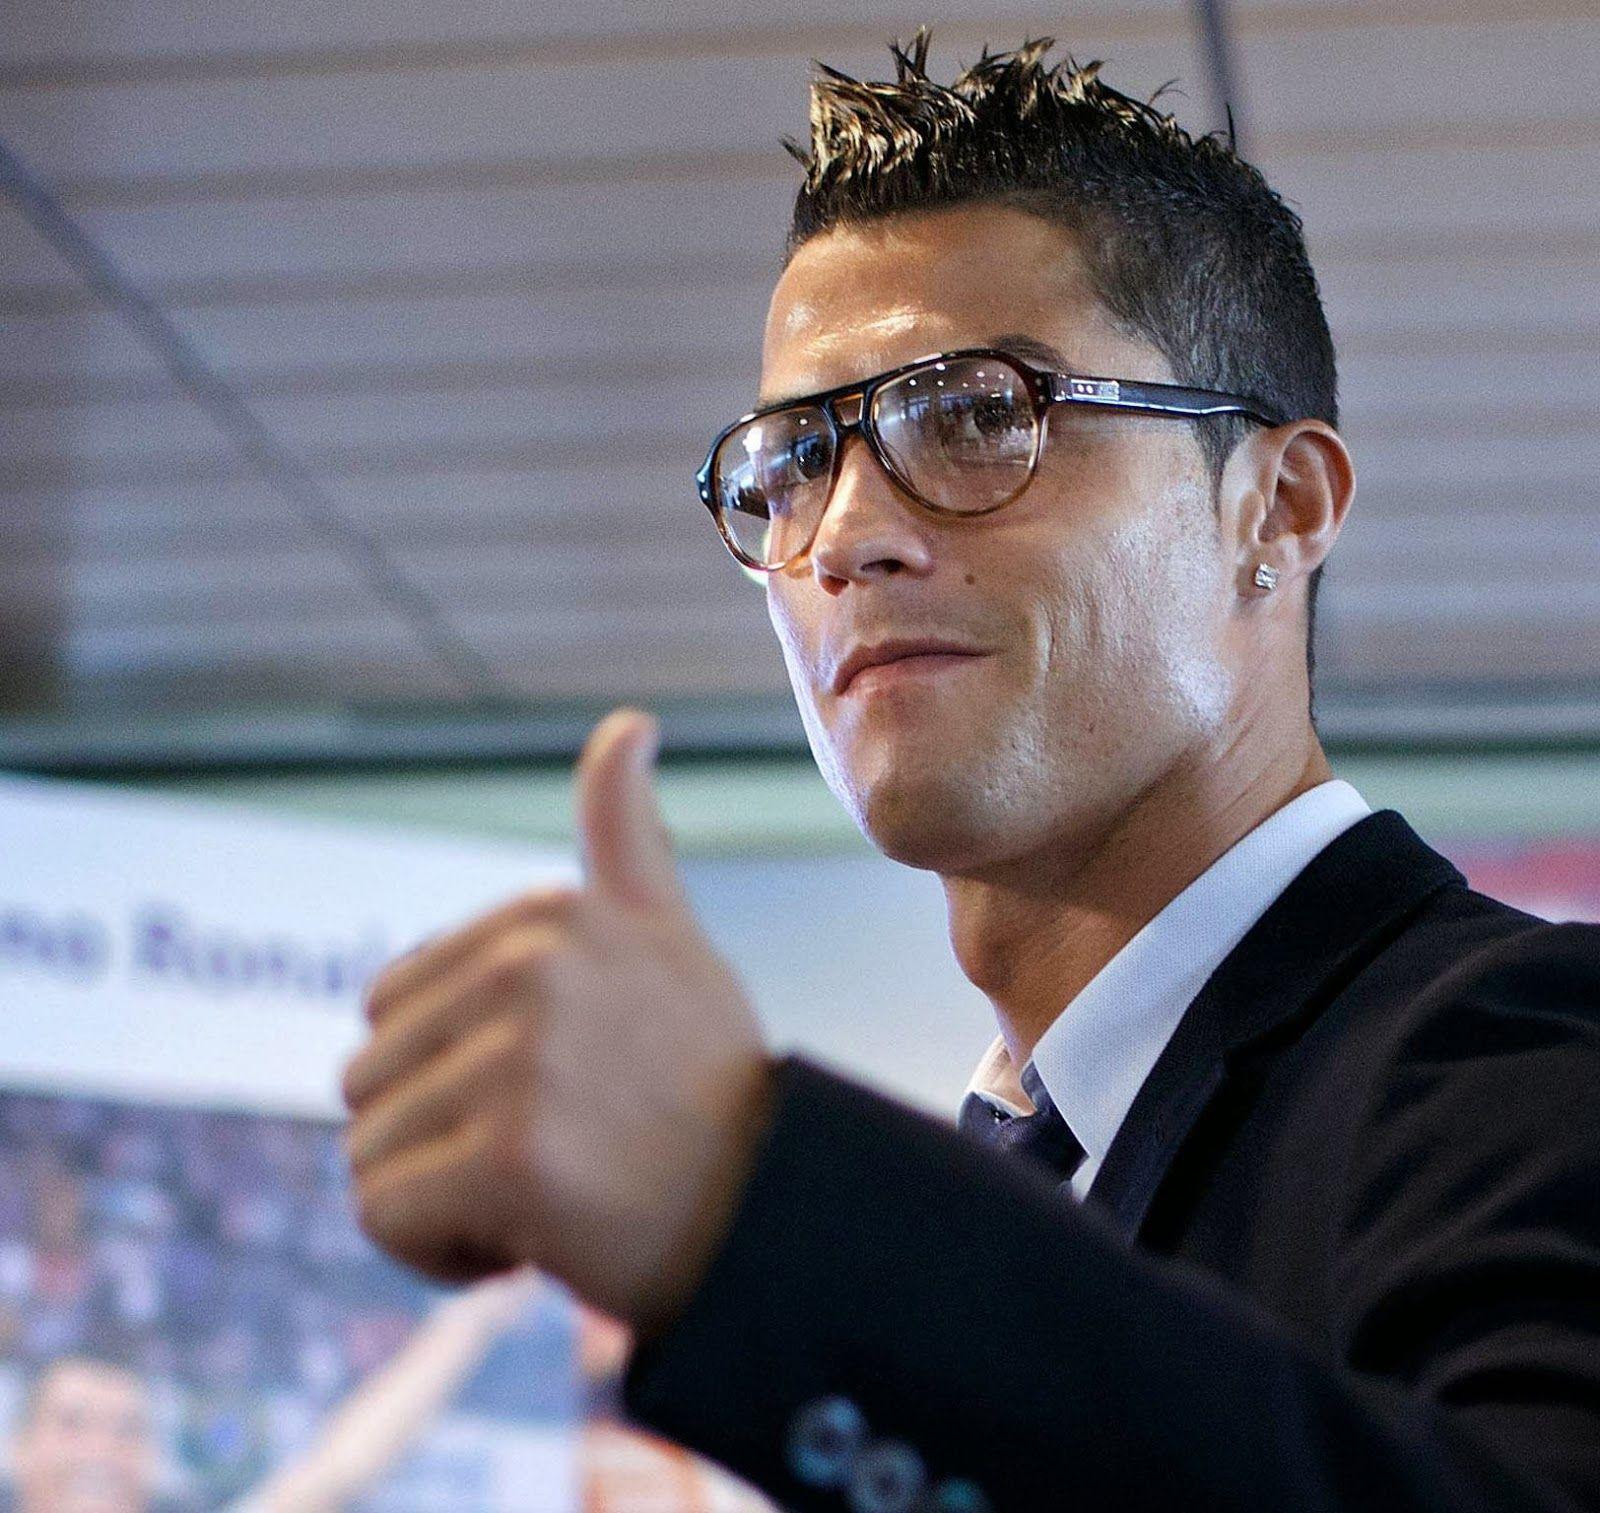 Wel e to Icon 360 Blog Christiano Ronaldo crowned as 2013 2014